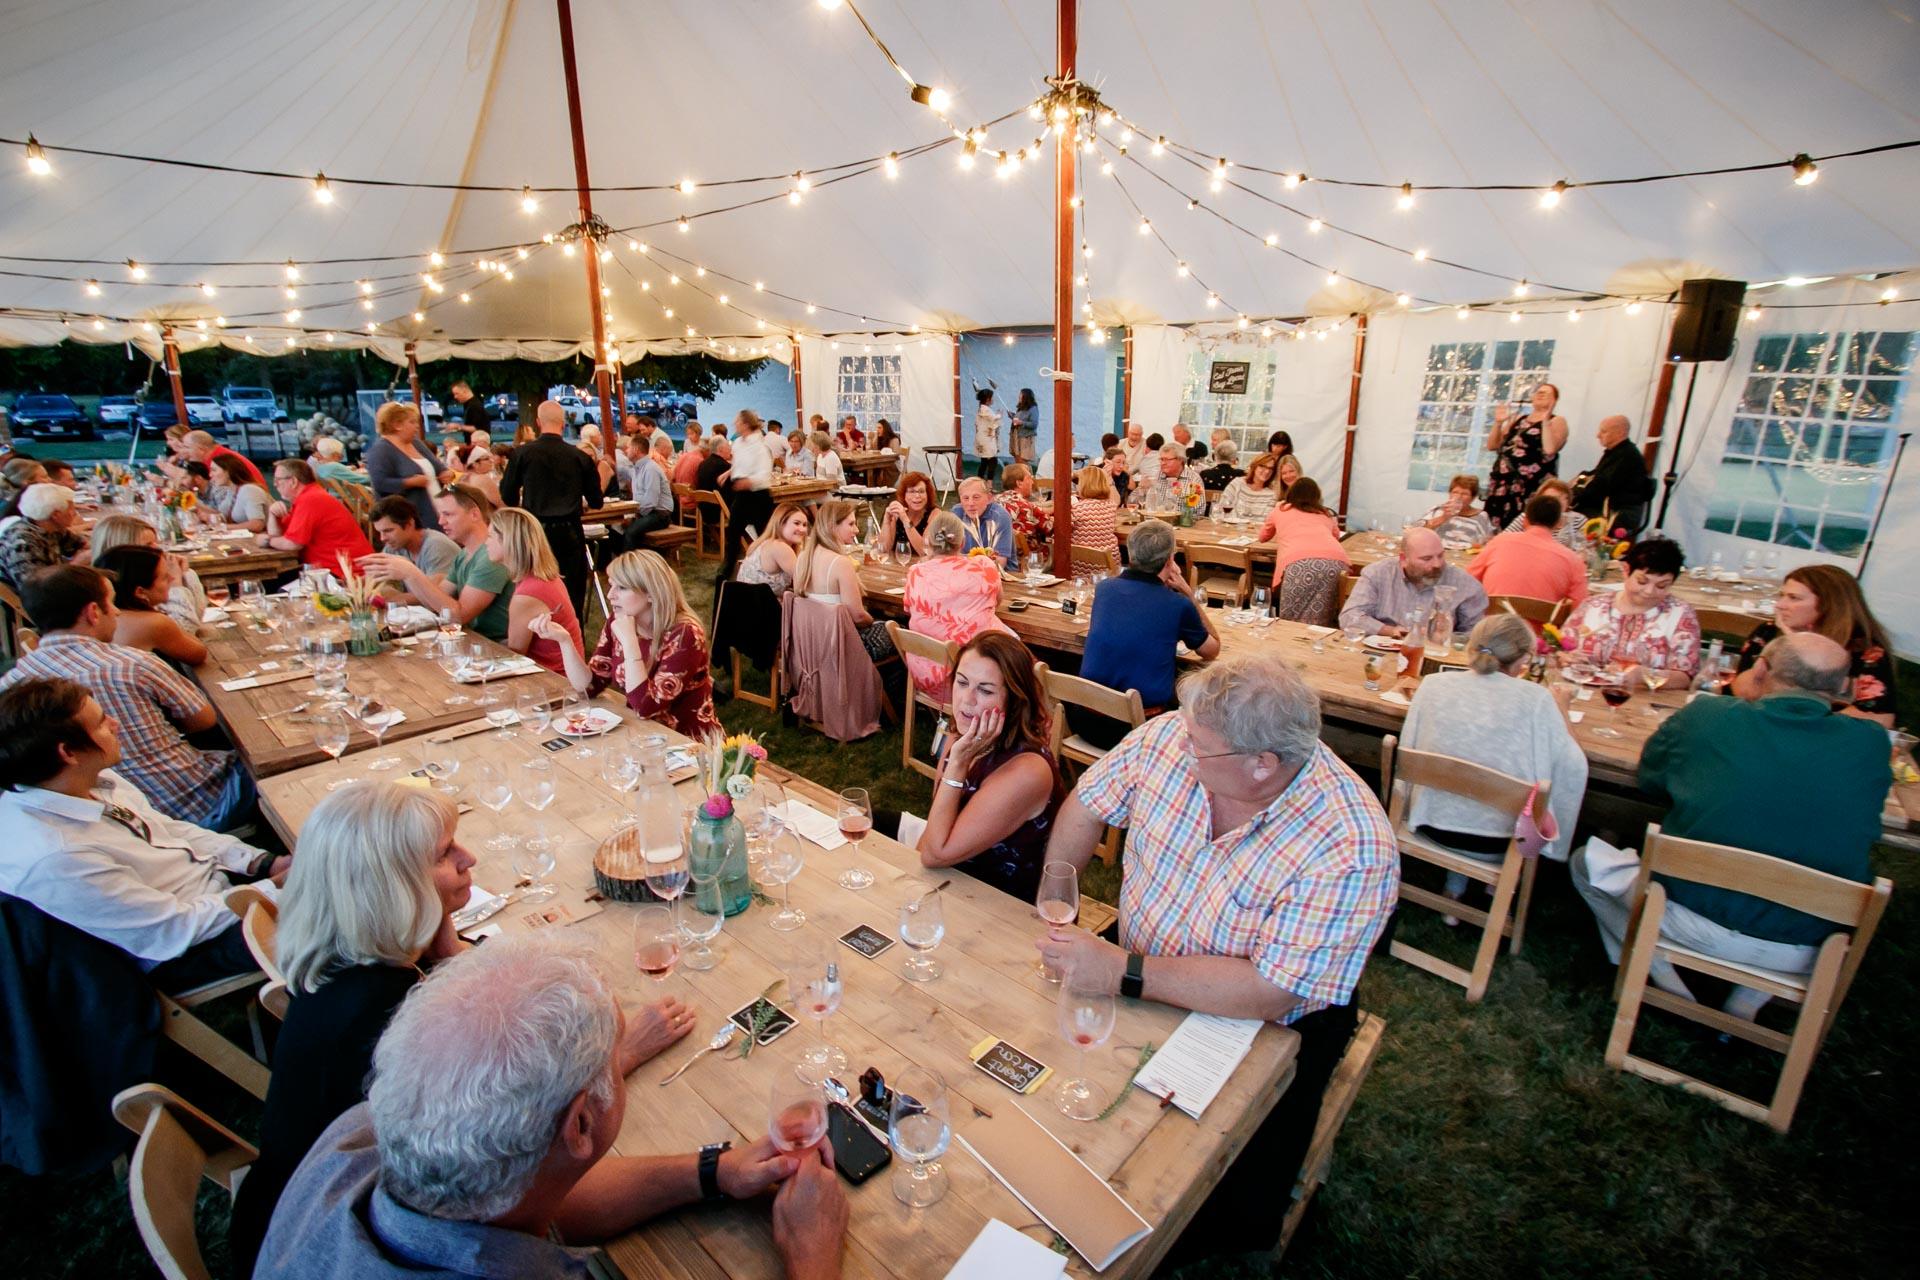 future-neenah-sunset-dinner-farm-to-table-adam-shea-photography-green-bay-appleton-neenah-photographer-29.jpg